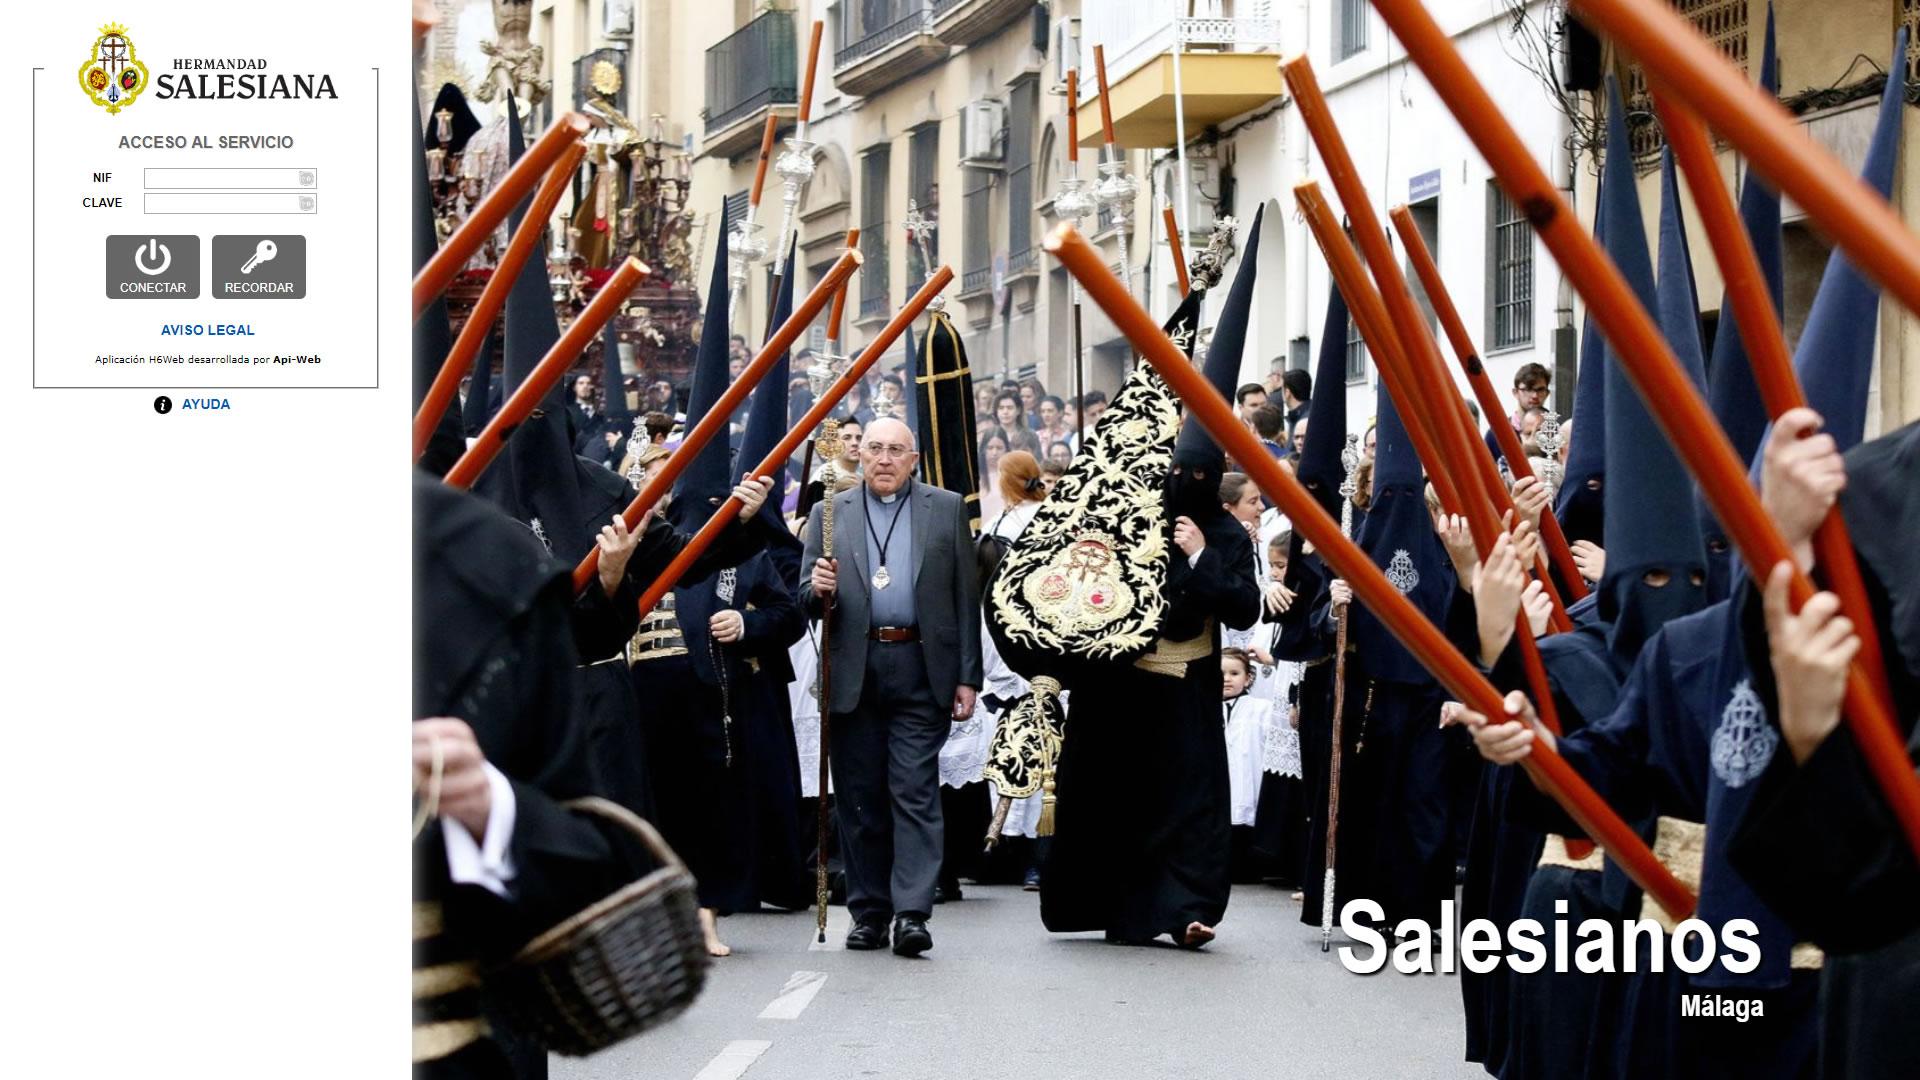 H6Web: Hermandad Salesiana (Málaga)